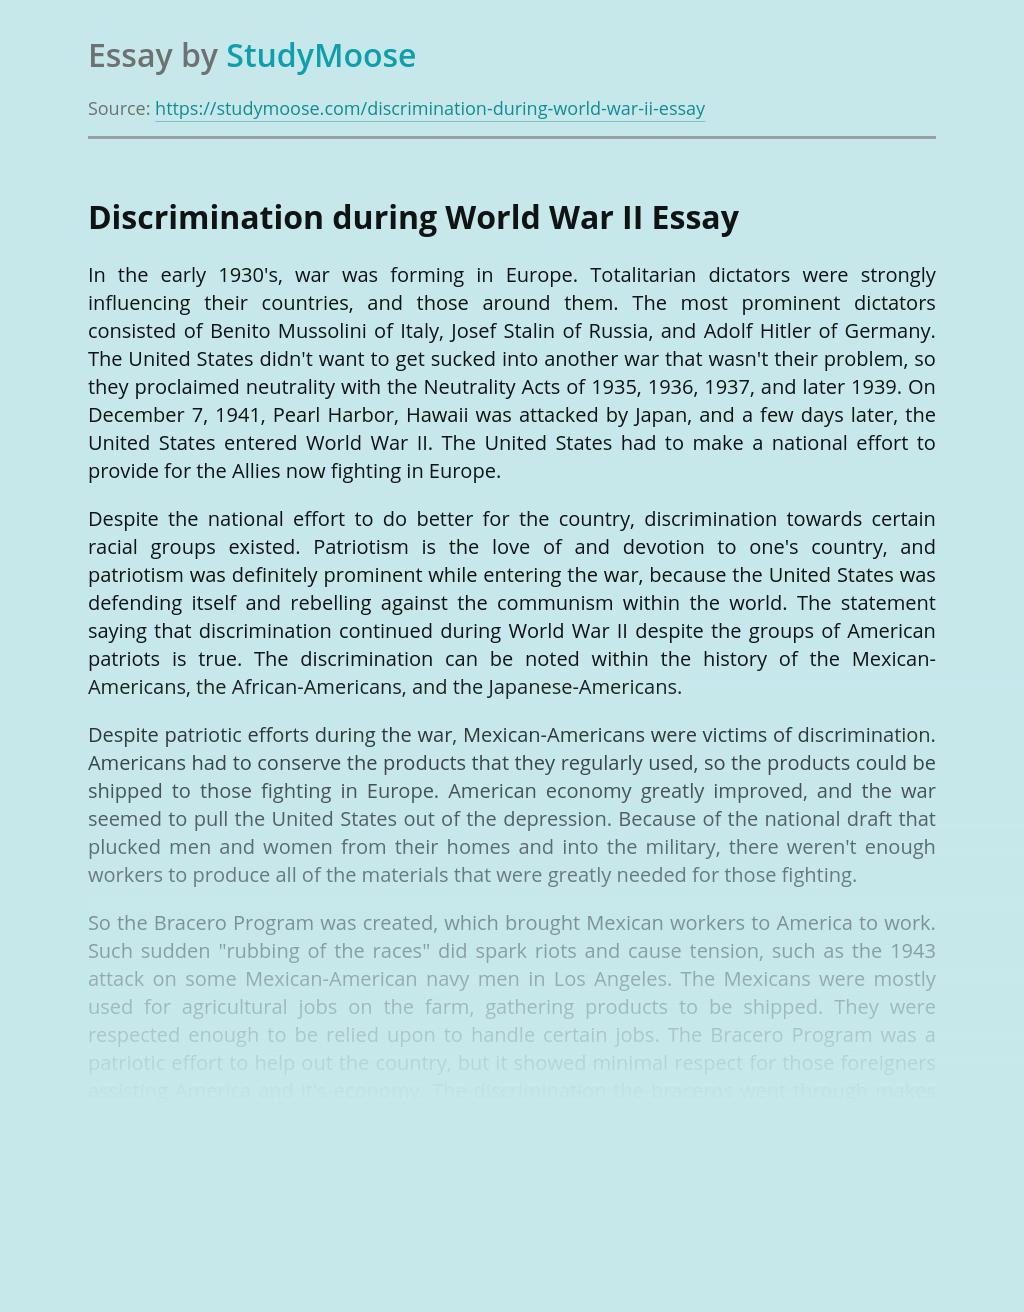 Discrimination during World War II